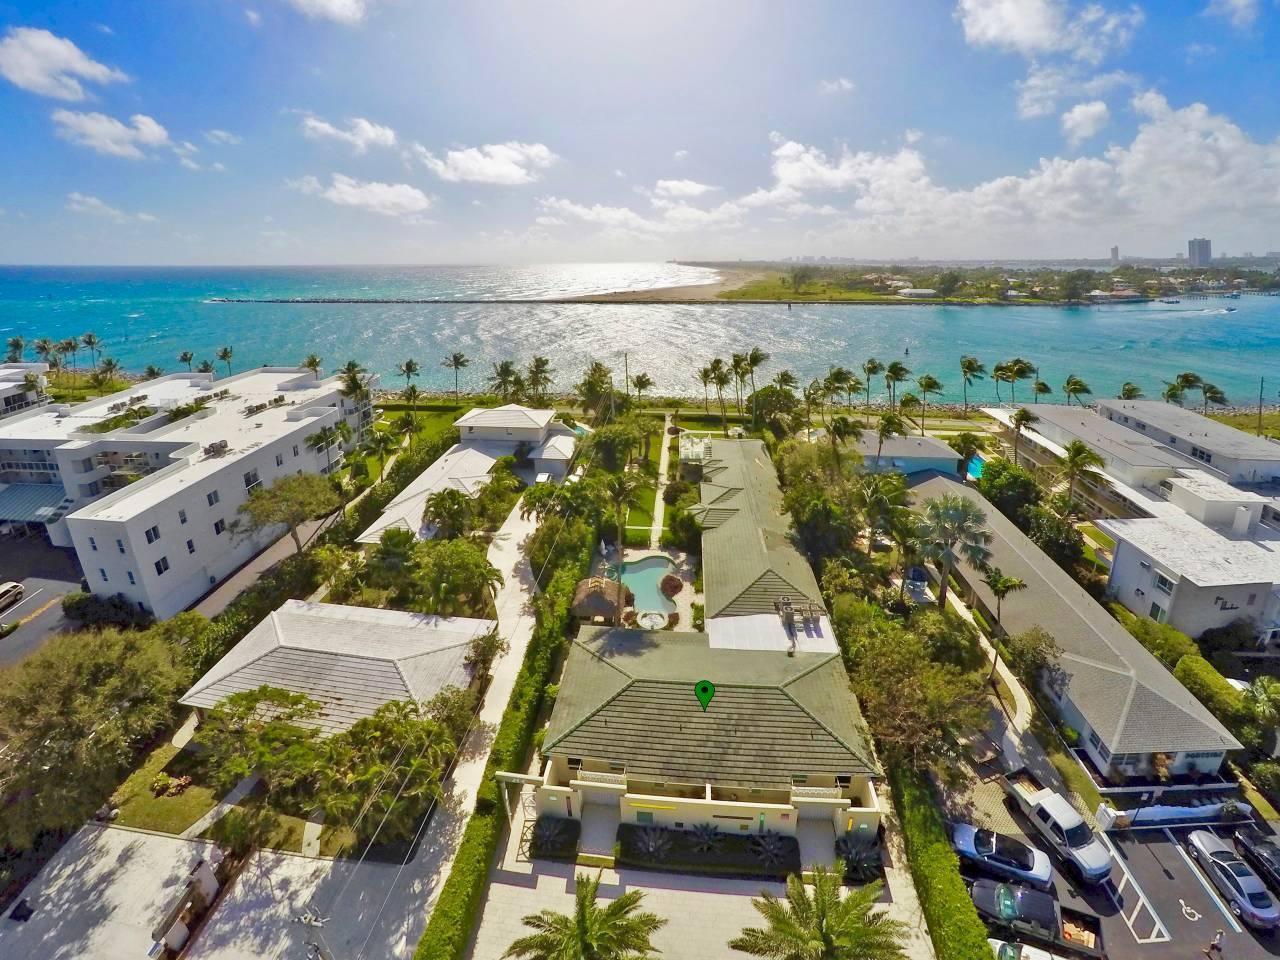 200 Inlet Way,Palm Beach Shores,Florida 33404,1 Bedroom Bedrooms,1 BathroomBathrooms,Apartment,Inlet,RX-10620164